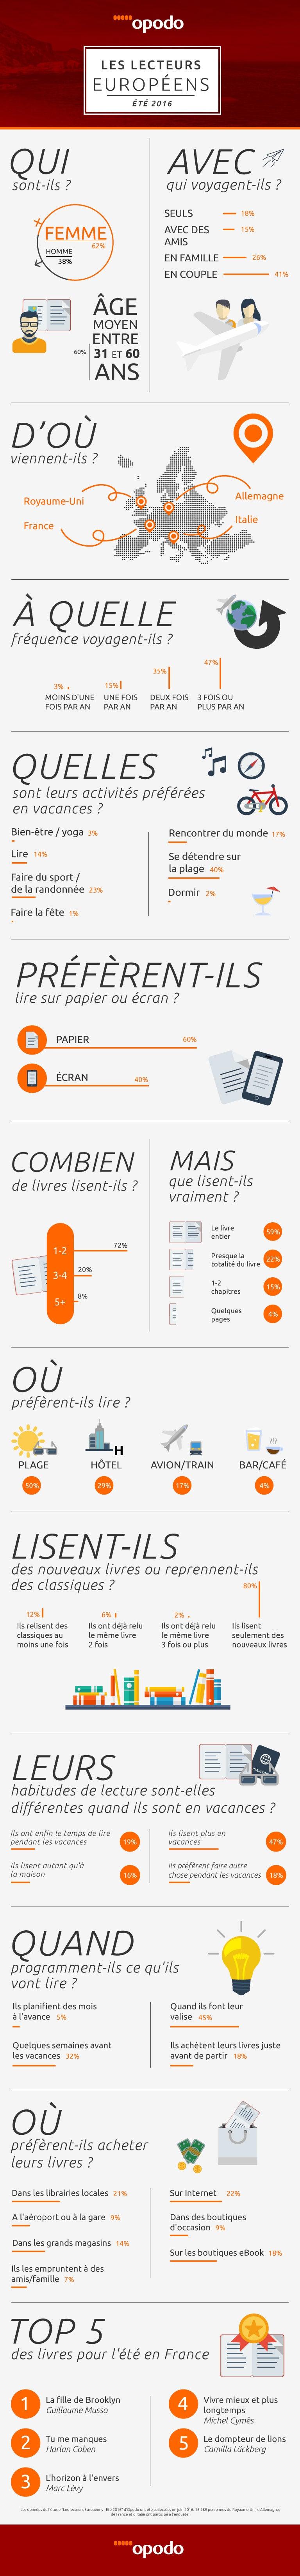 travelbook-survey-opodo-european-readers